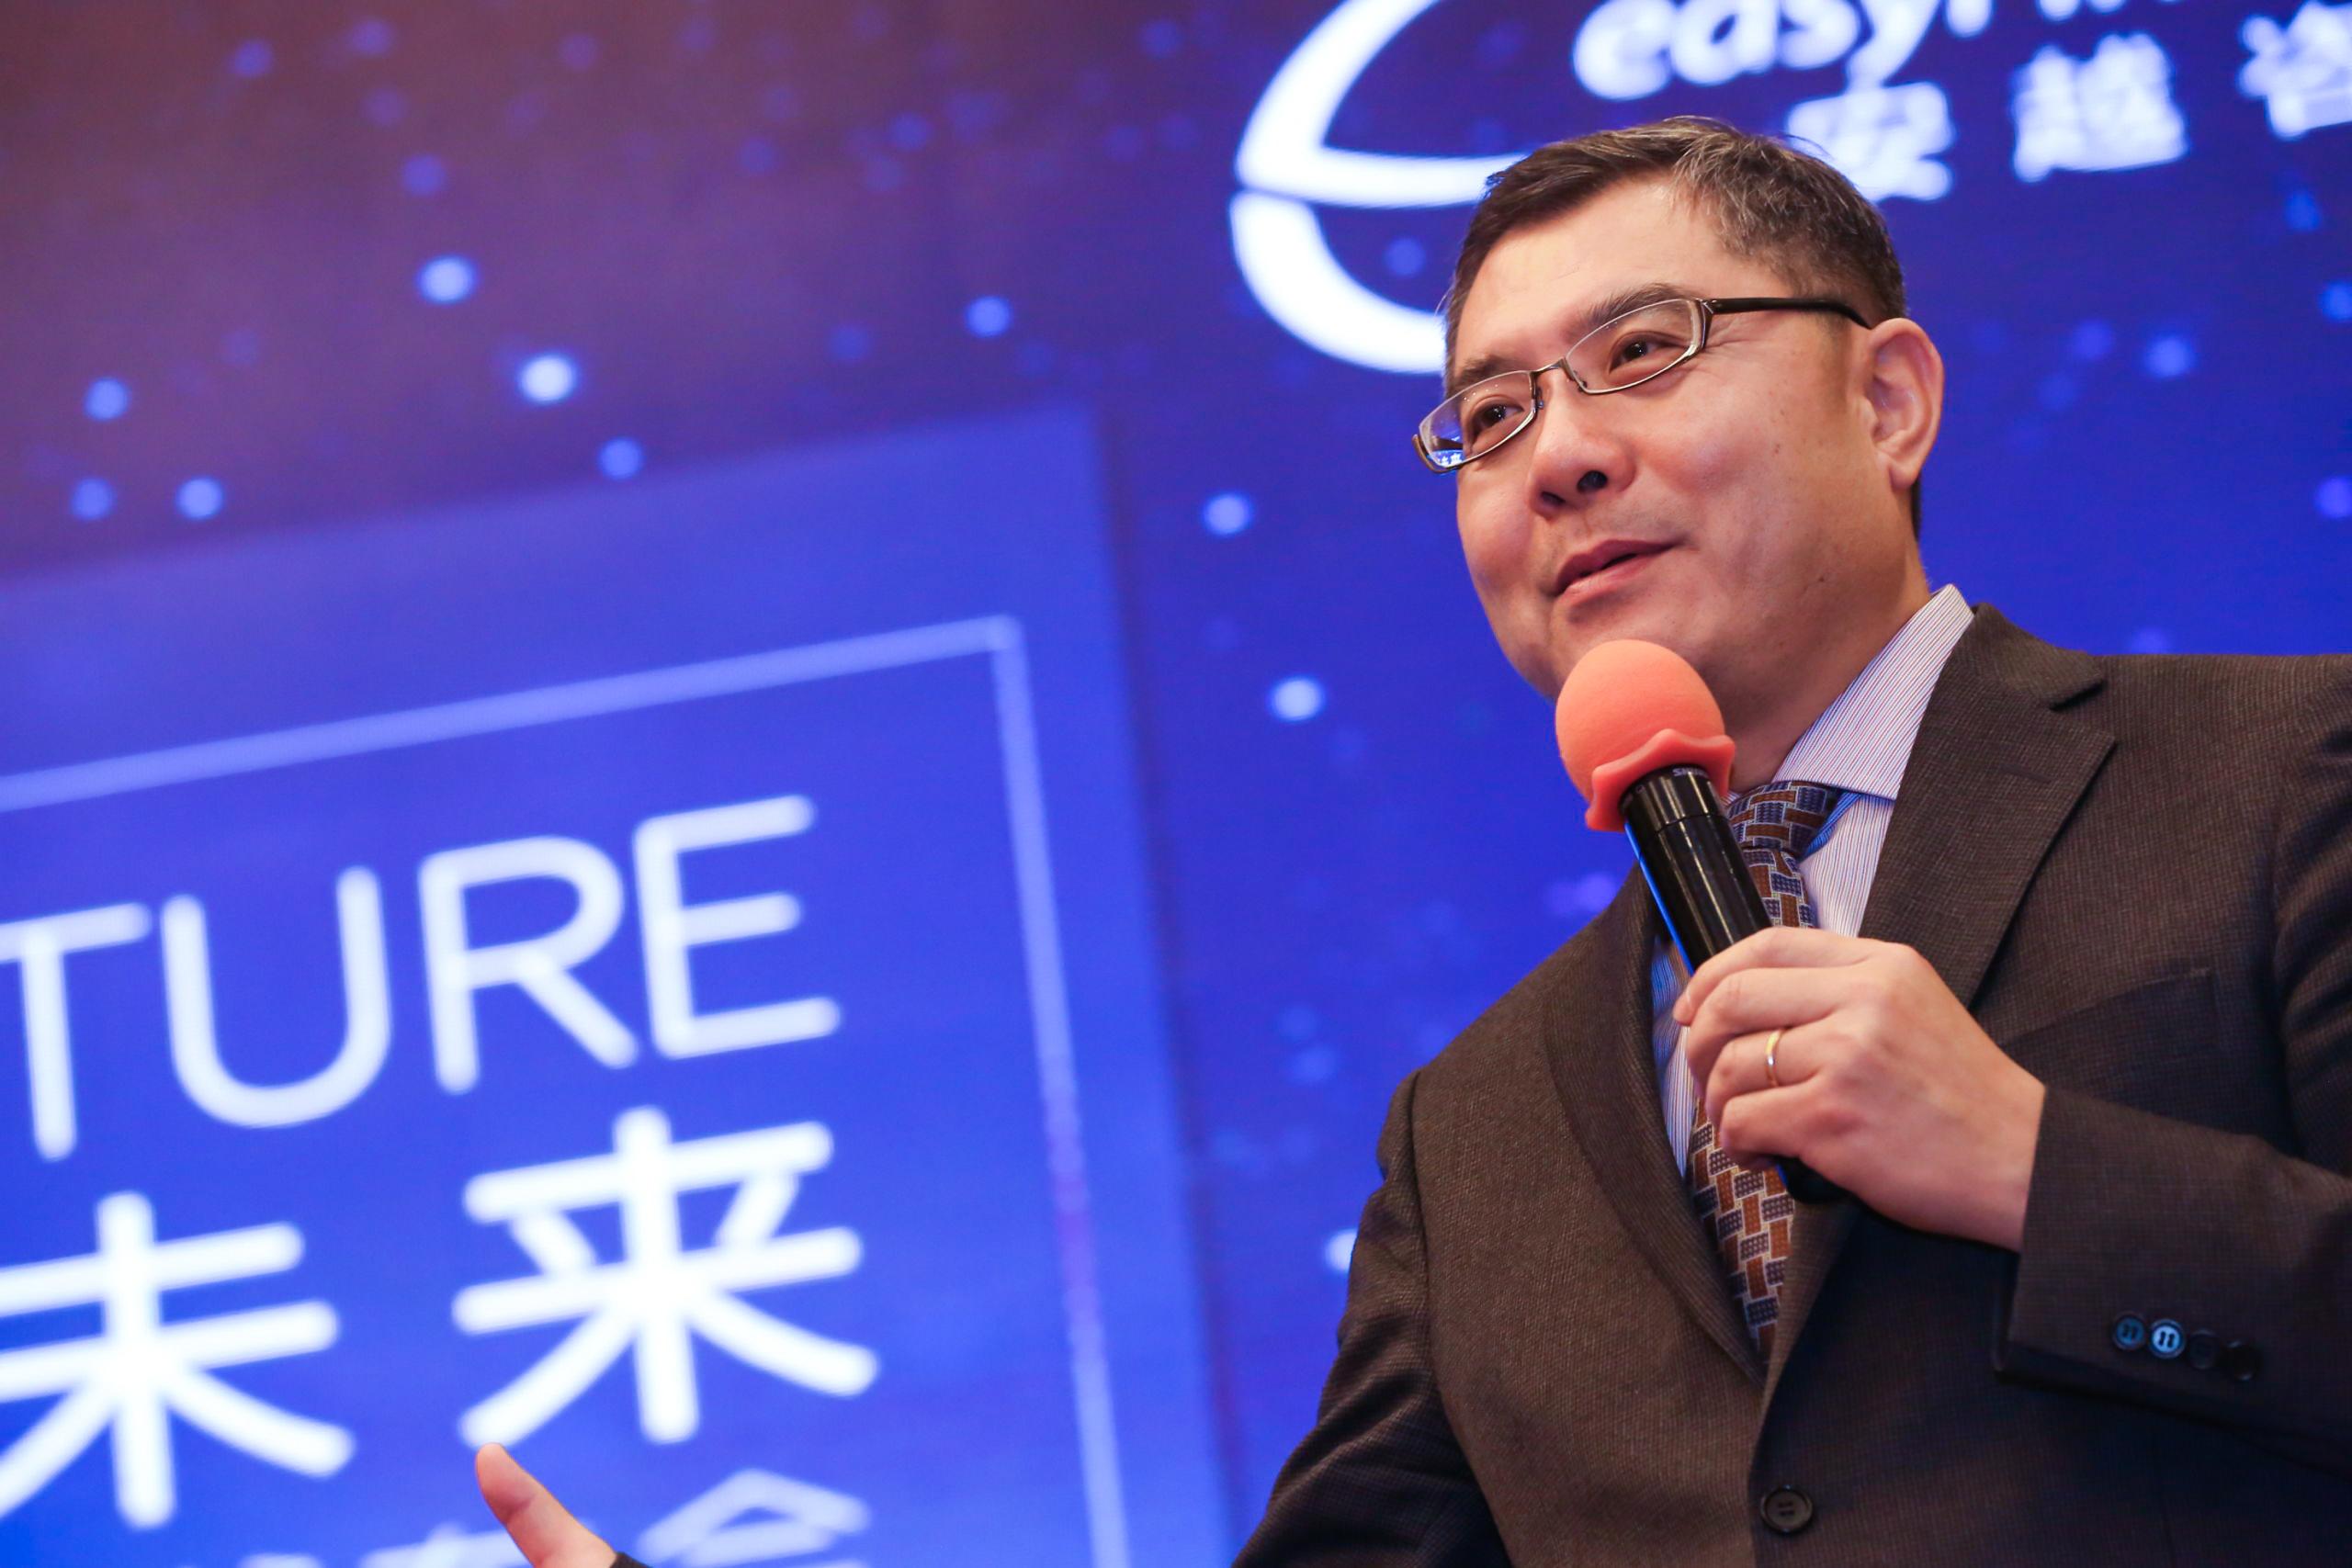 IMA亚太区总监 白俊江先生  上台致辞